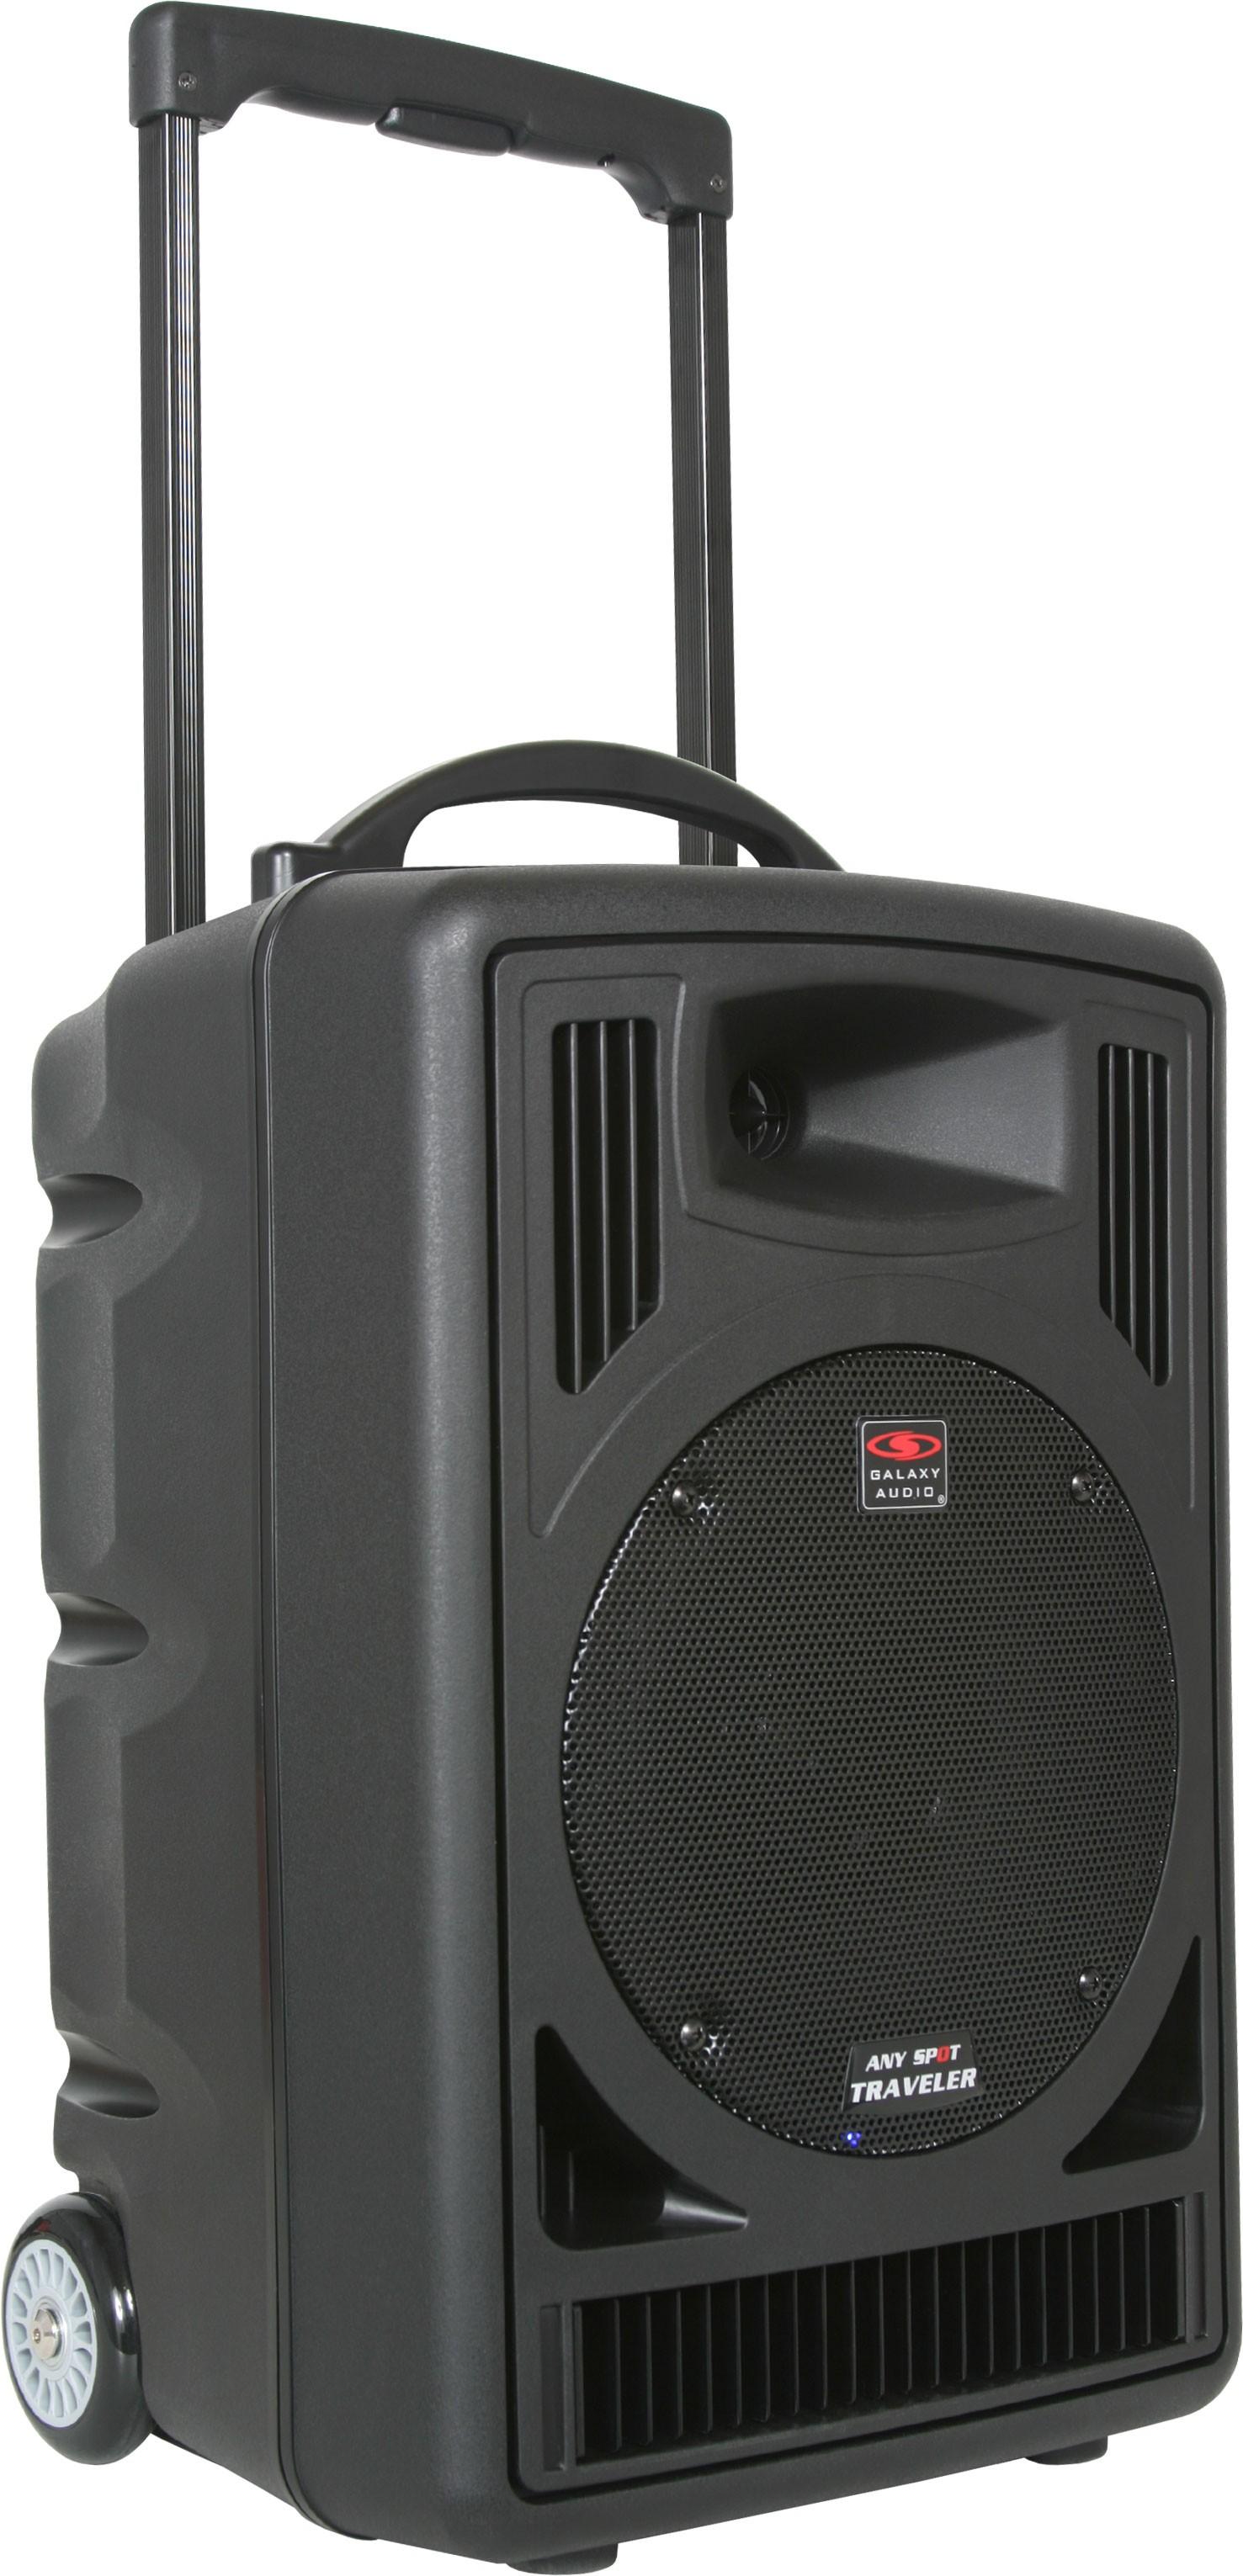 Traveller Wireless Remote Control Galaxy Audio Tv8